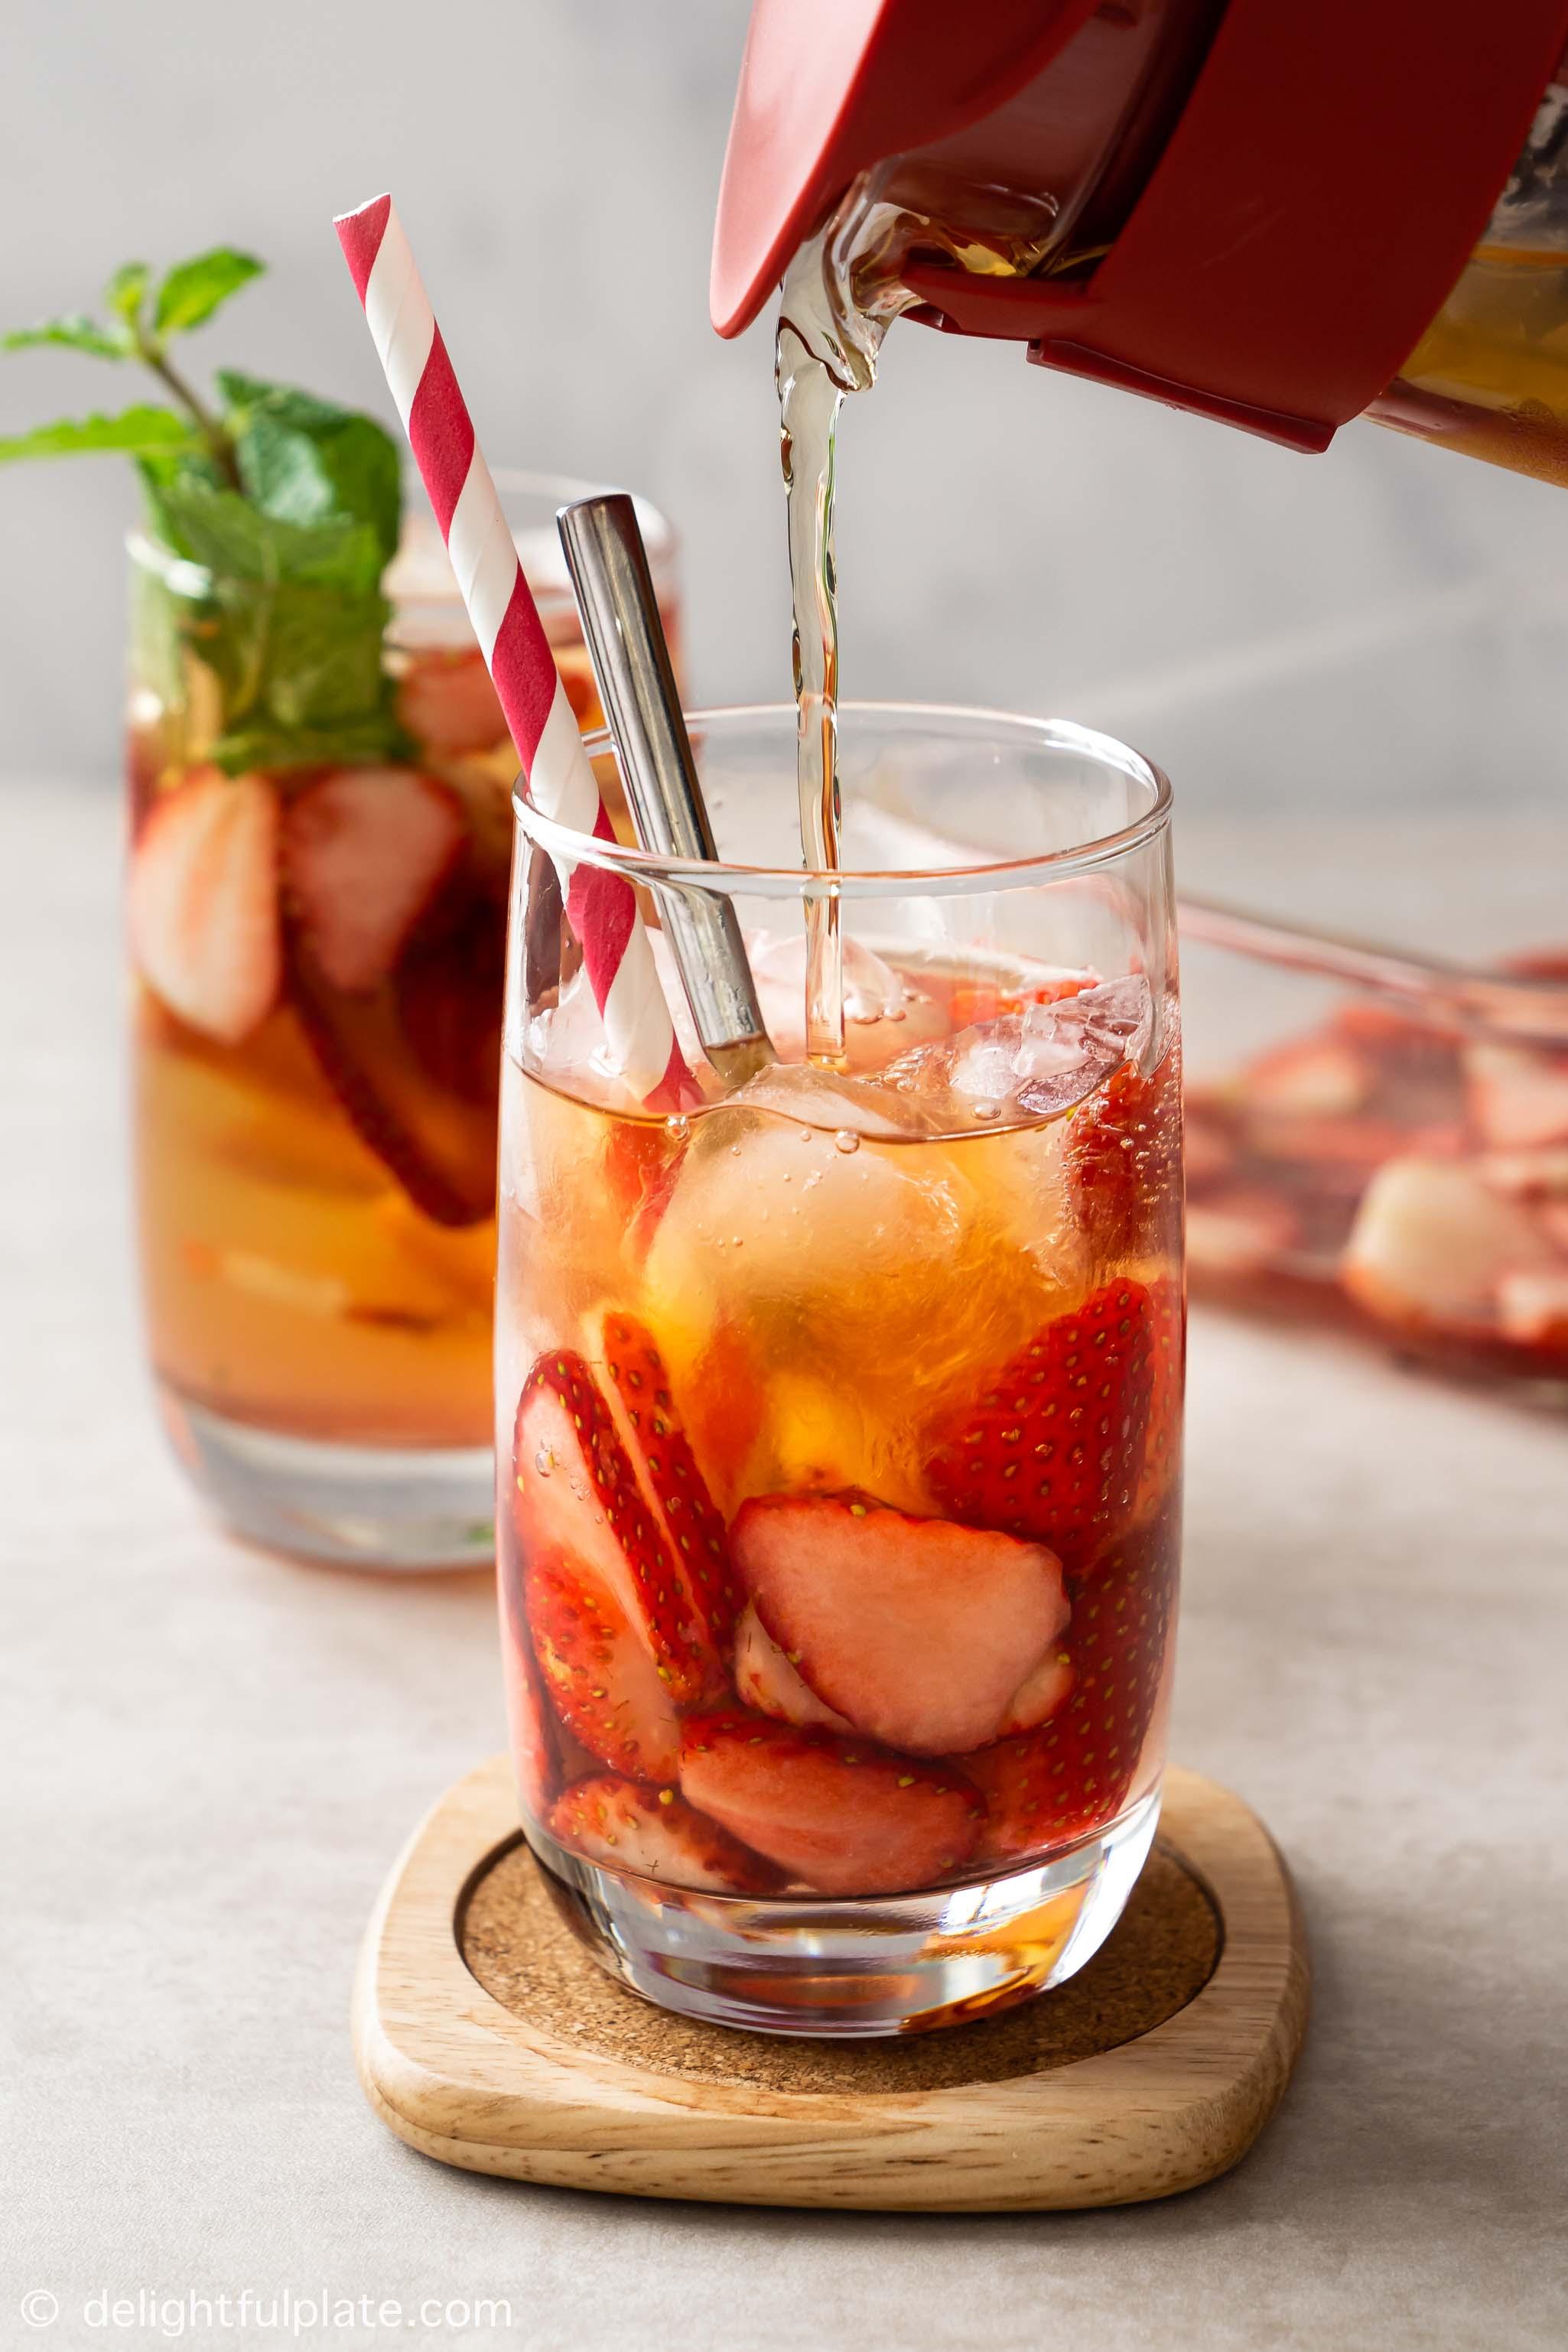 a glass of strawberry sweet tea